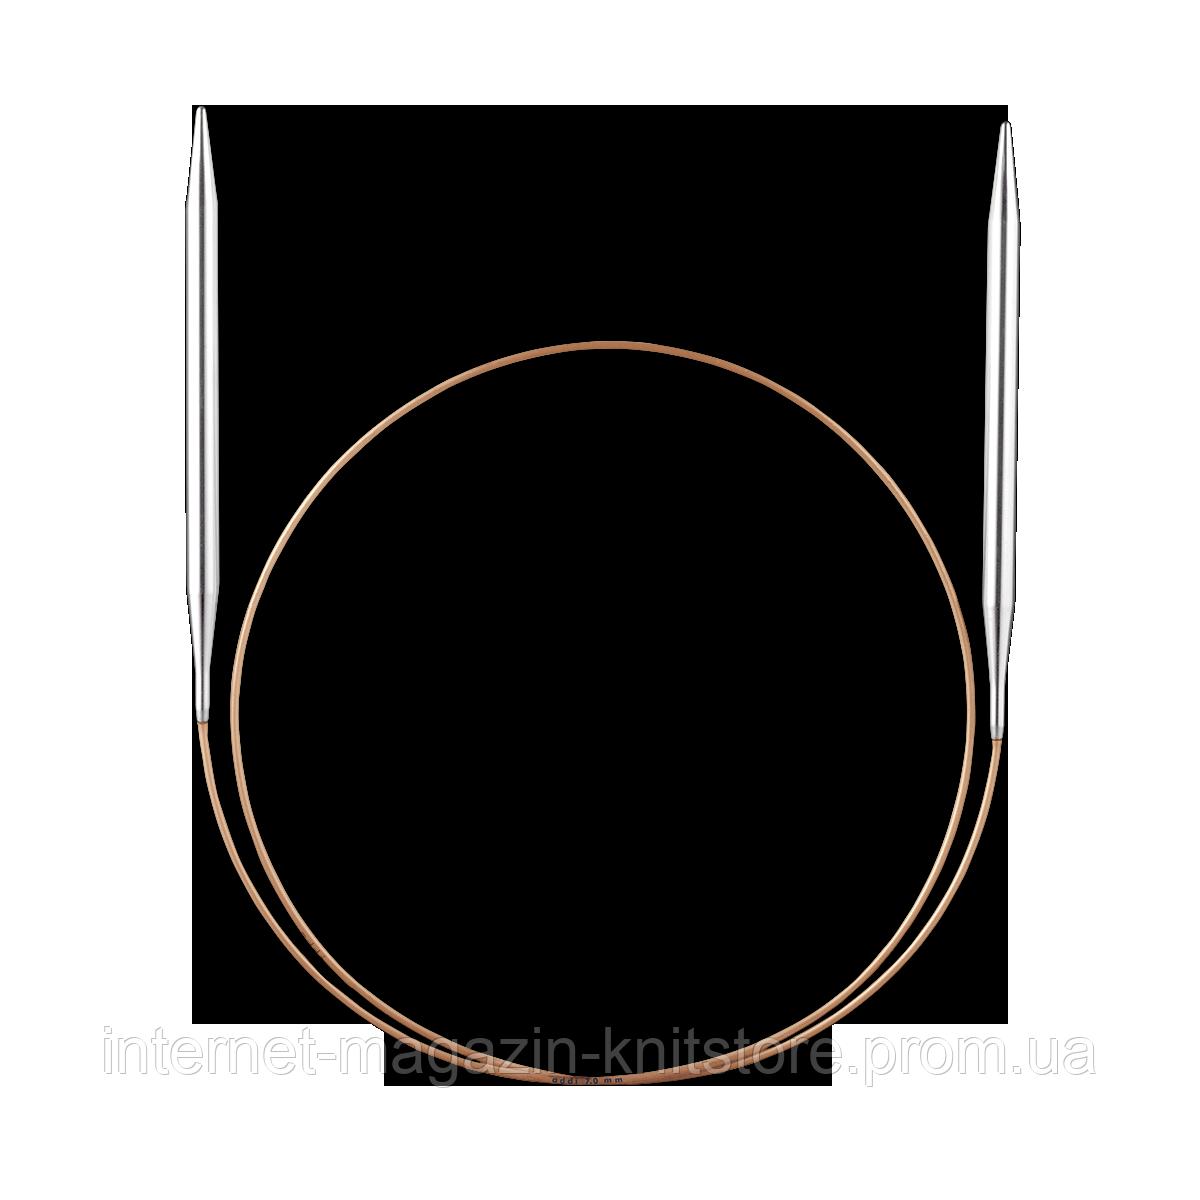 Спицы Addi 60 см/2.5 мм круговые